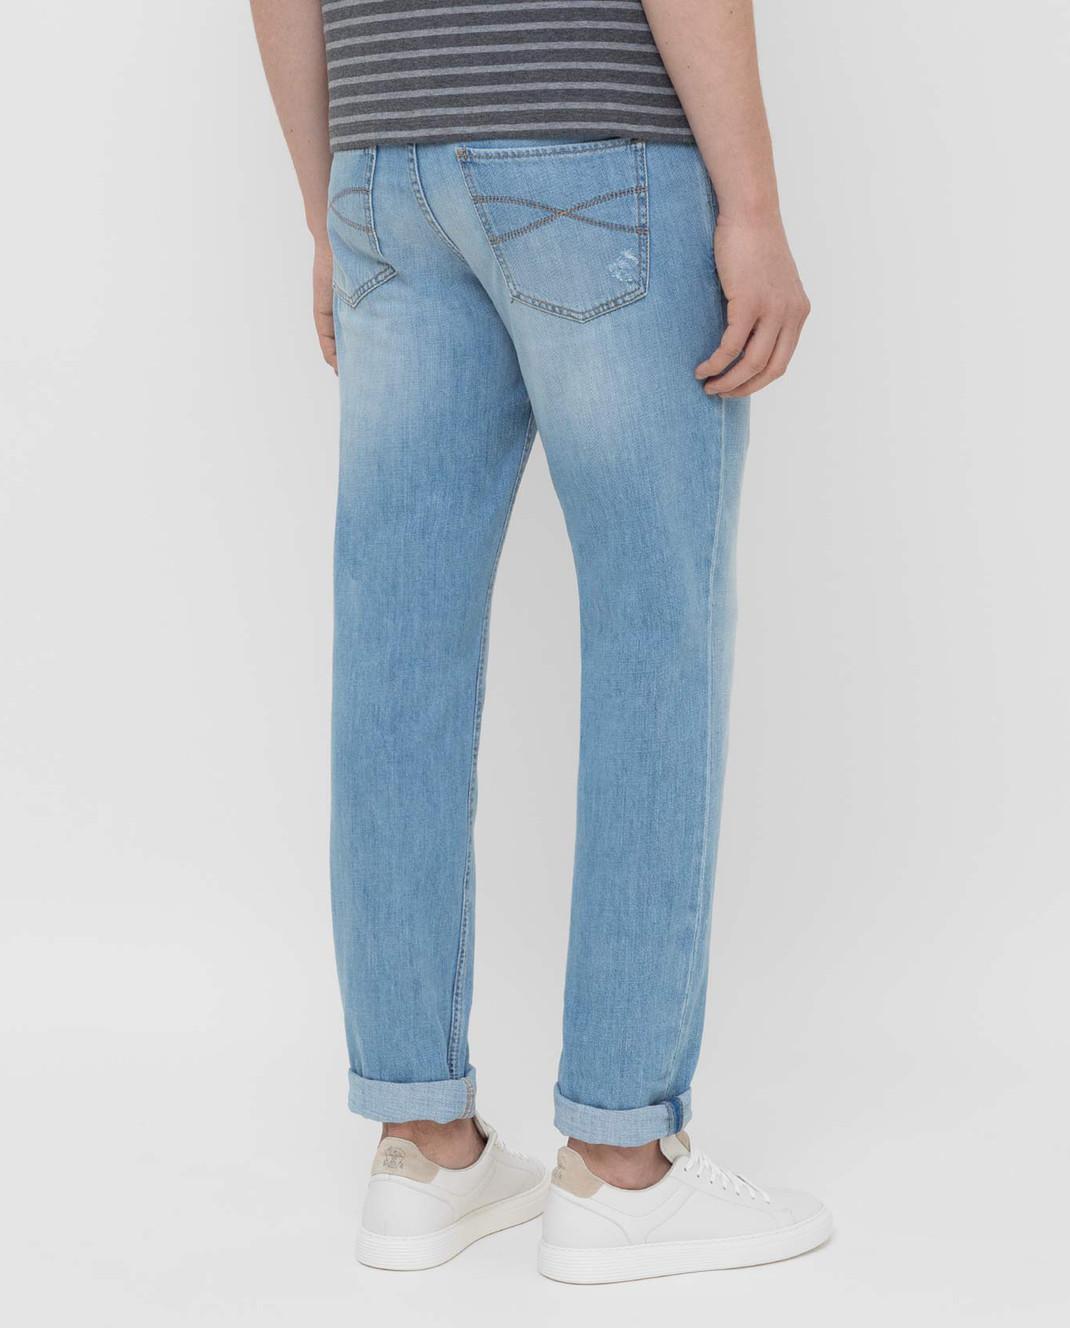 Brunello Cucinelli Голубые джинсы M0Z37D2360 изображение 4